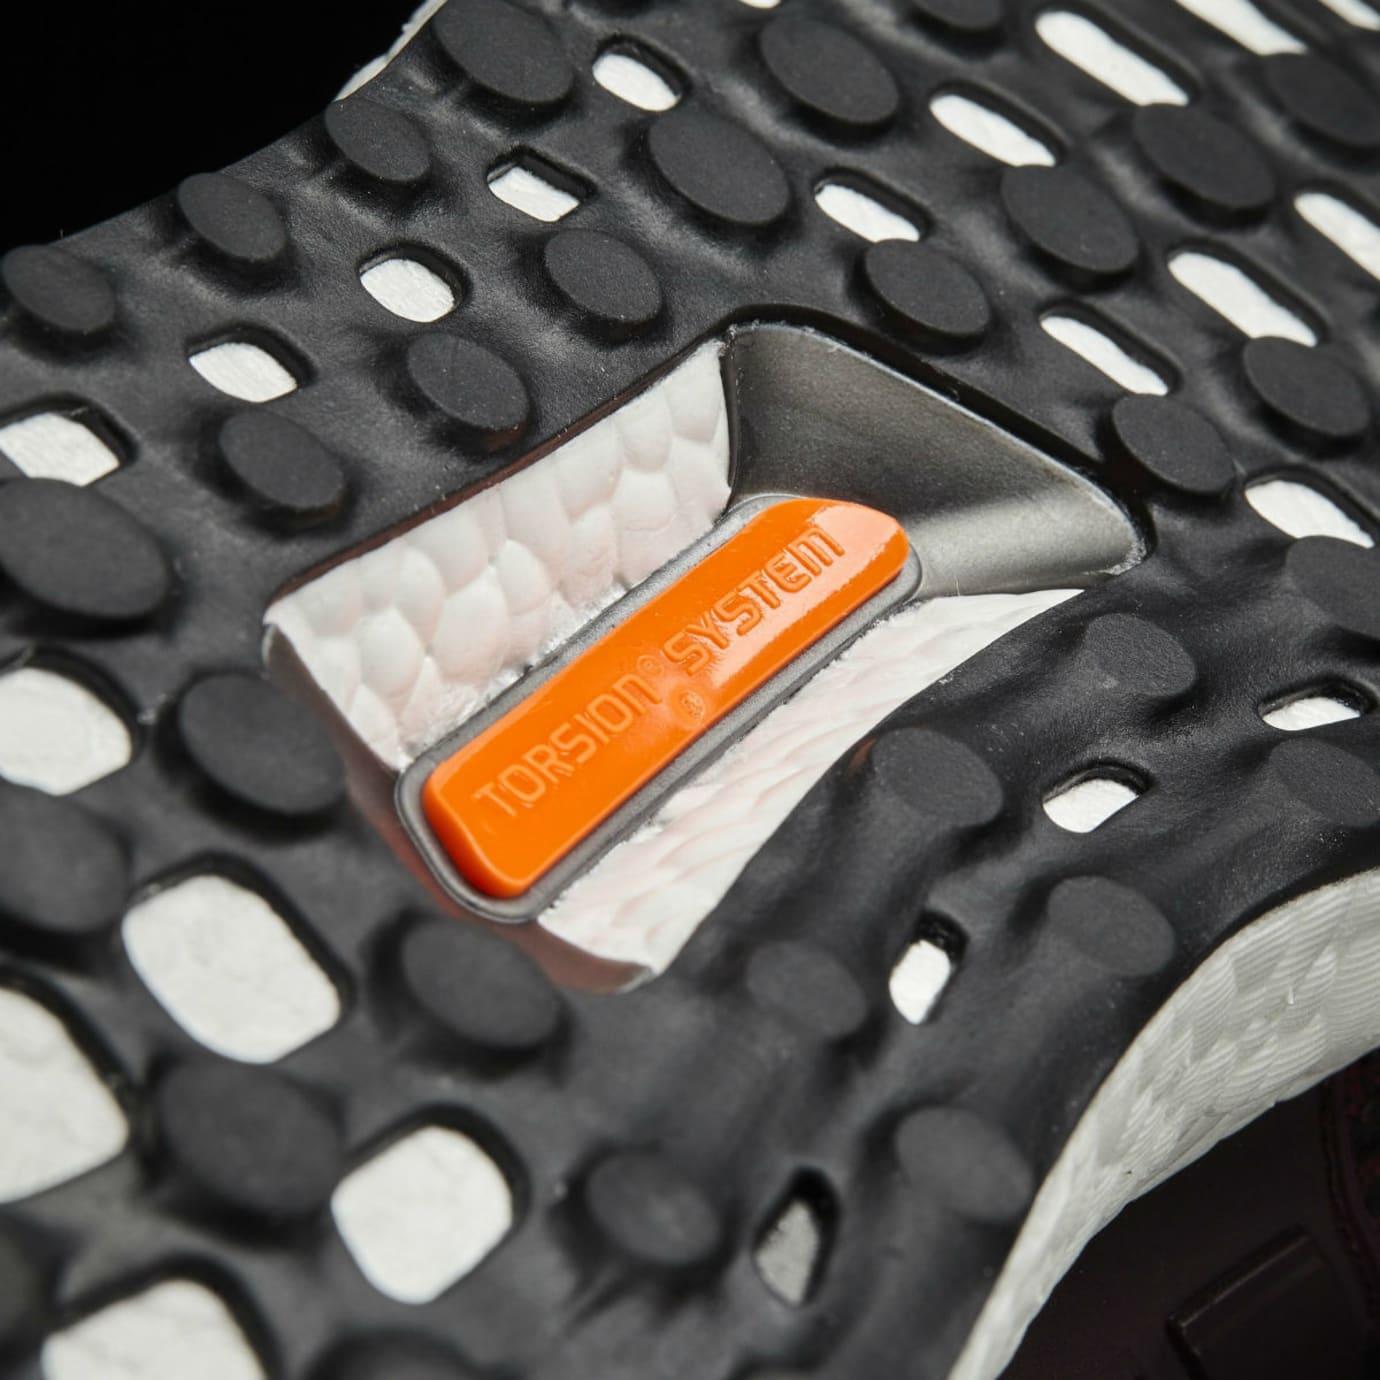 Adidas Ultra Boost 3.0 Dark Burgundy Release Date Outsole S80732